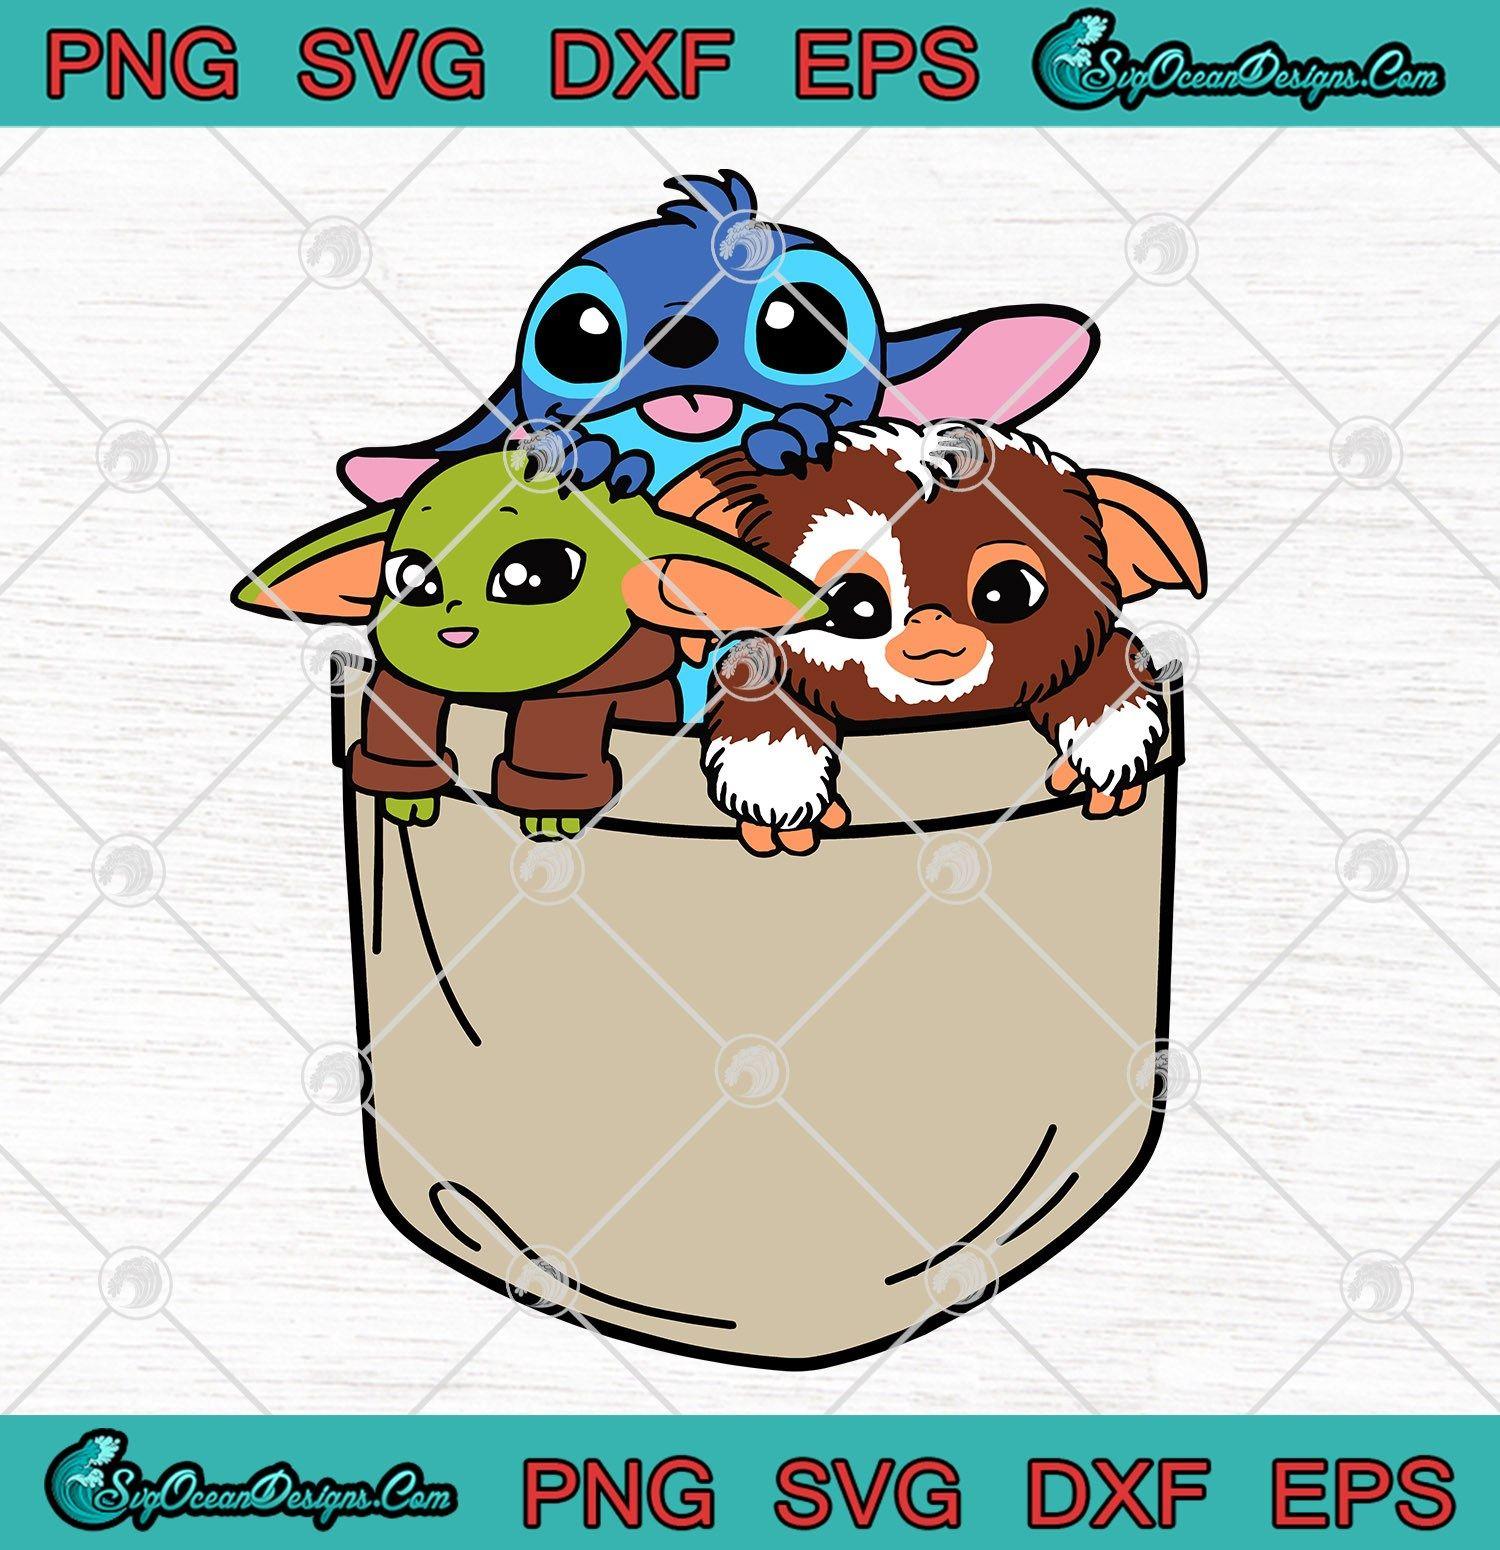 Baby Yoda Stitch Gizmo In A Pocket Art Svg Png Eps Dxf Baby Yoda Stitch Gizmo Cute Svg Png Cute Cartoon Wallpapers Yoda Drawing Yoda Art